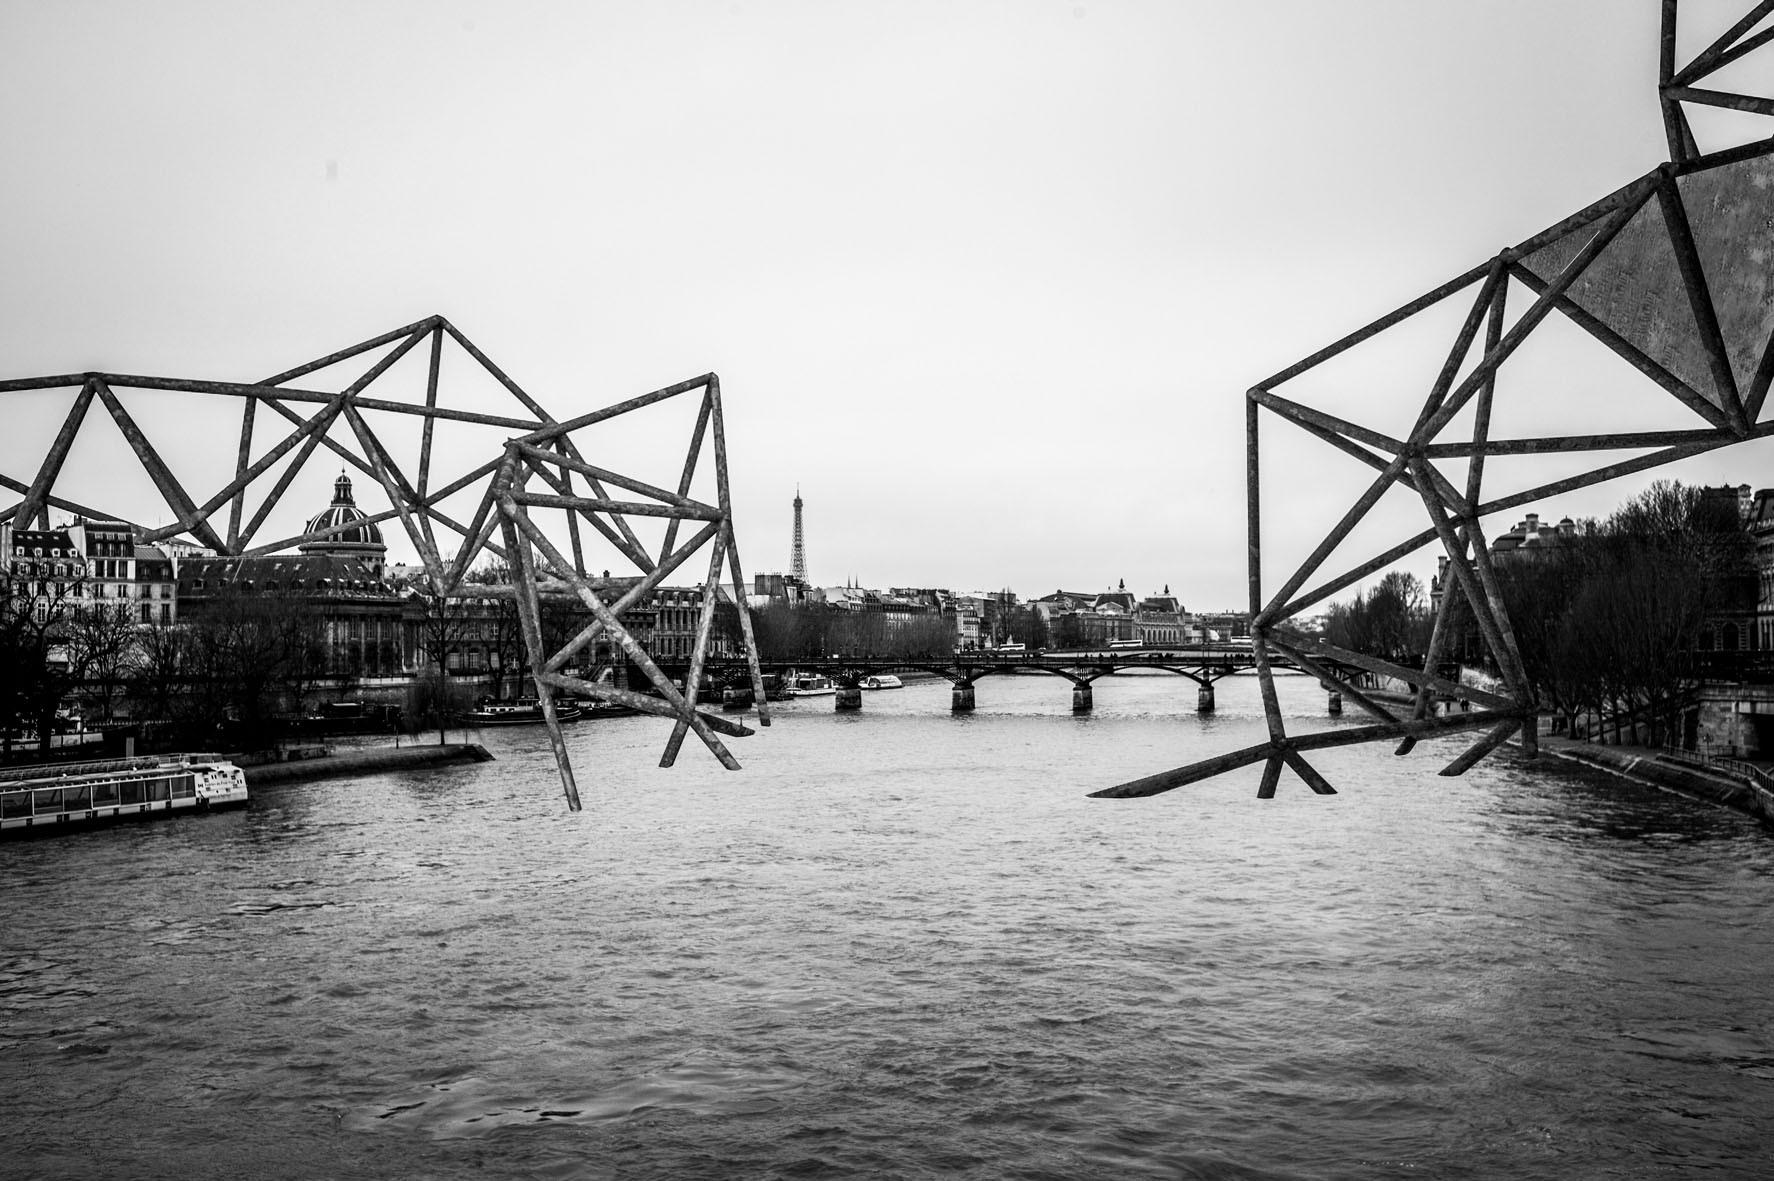 Mégastructure, Prix diffusion, Marianne Ferrand & Yan Aken